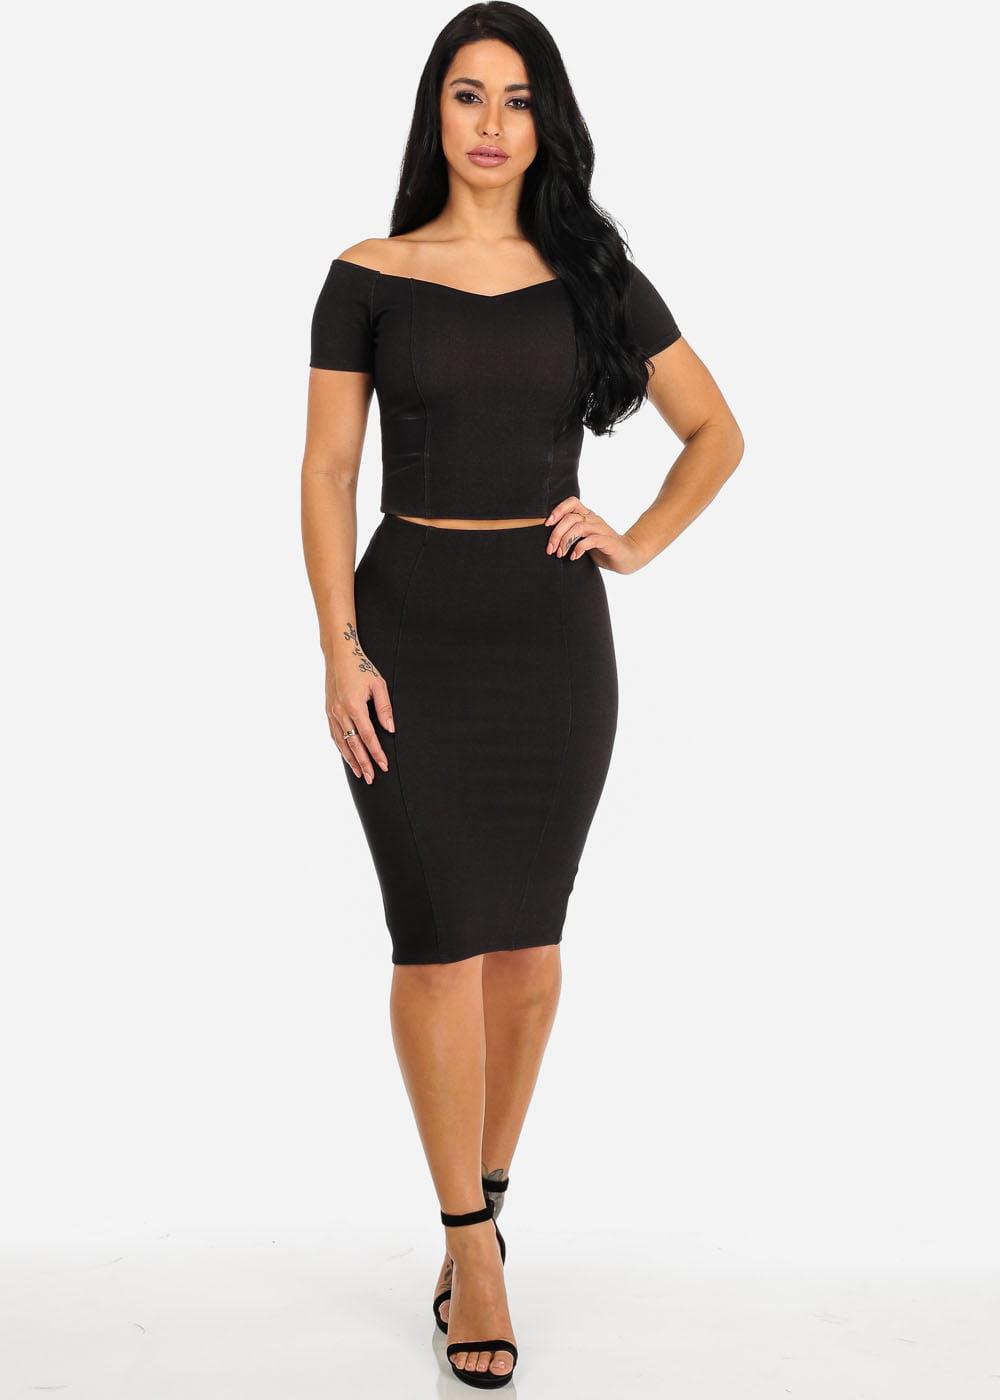 21ed22fee89c Off The Shoulder Pencil Skirt Dress – DACC